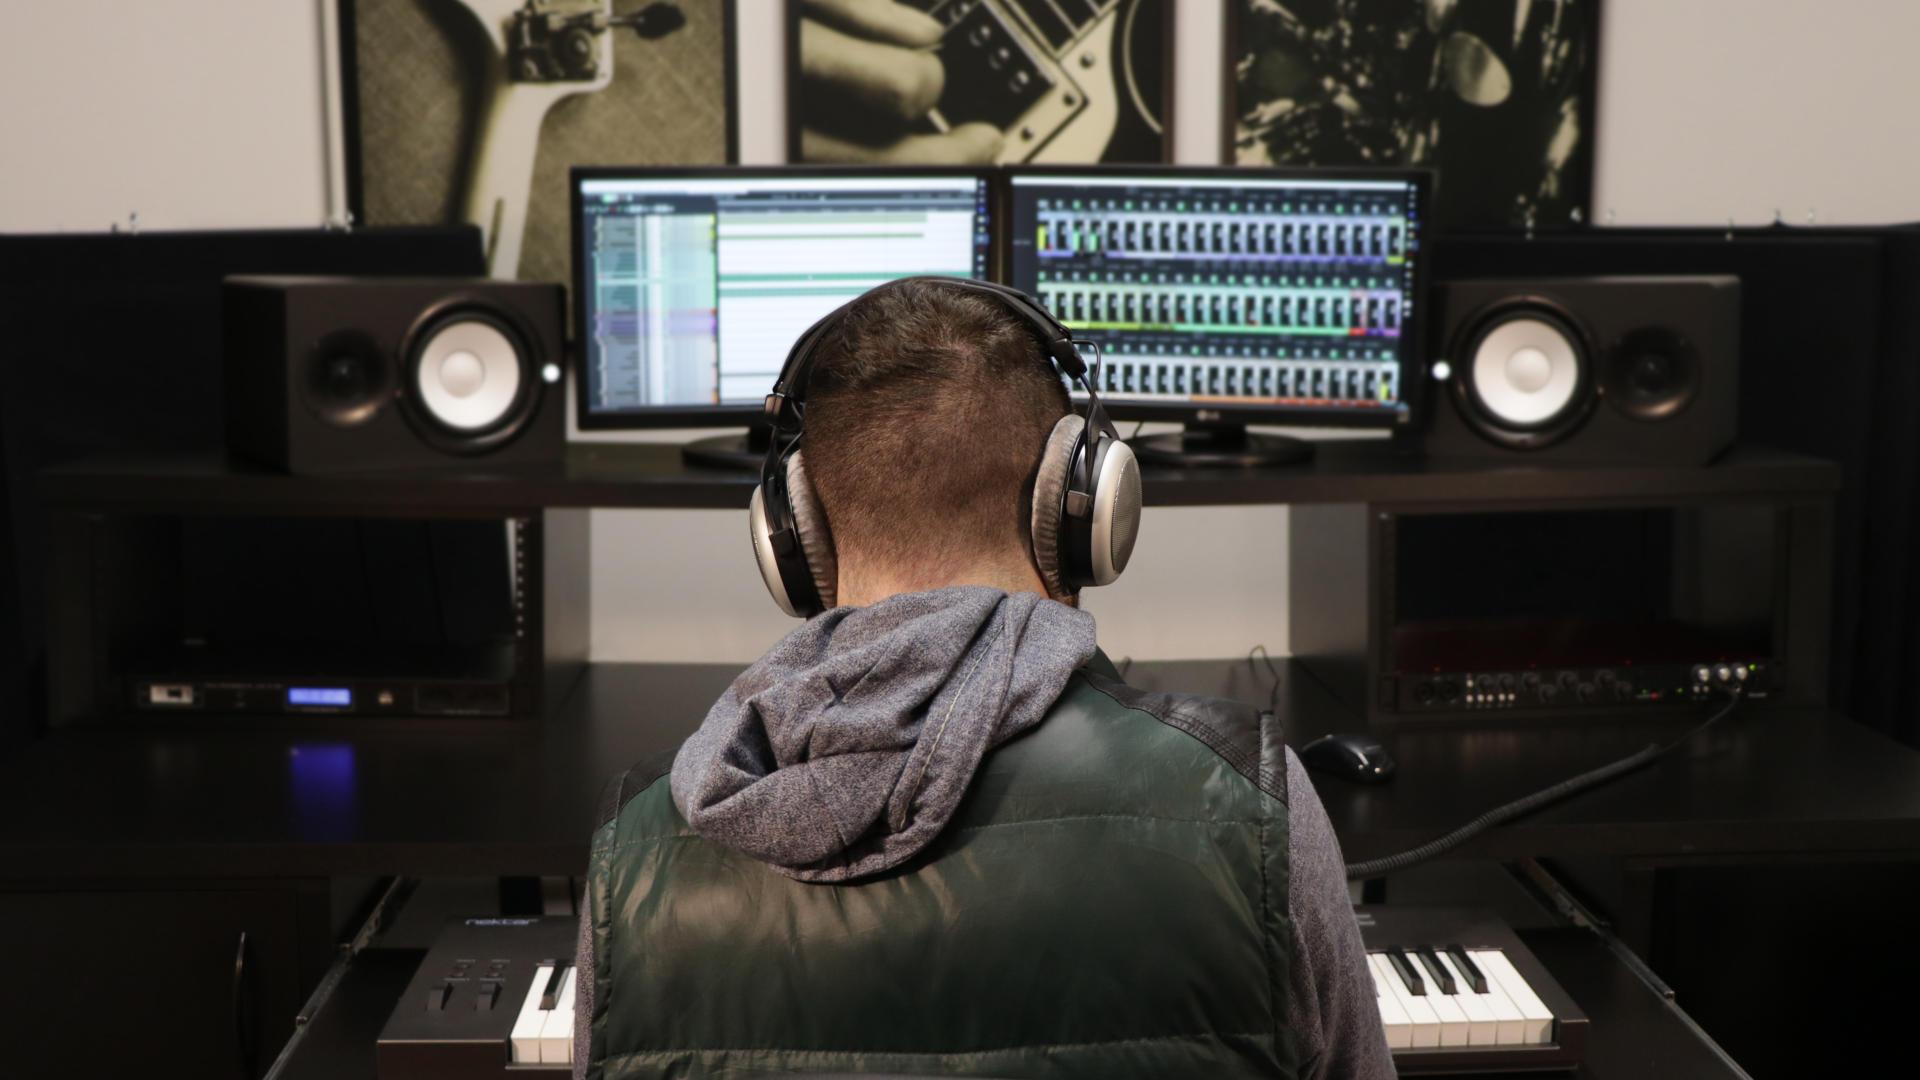 Rodrigo Passos producing music